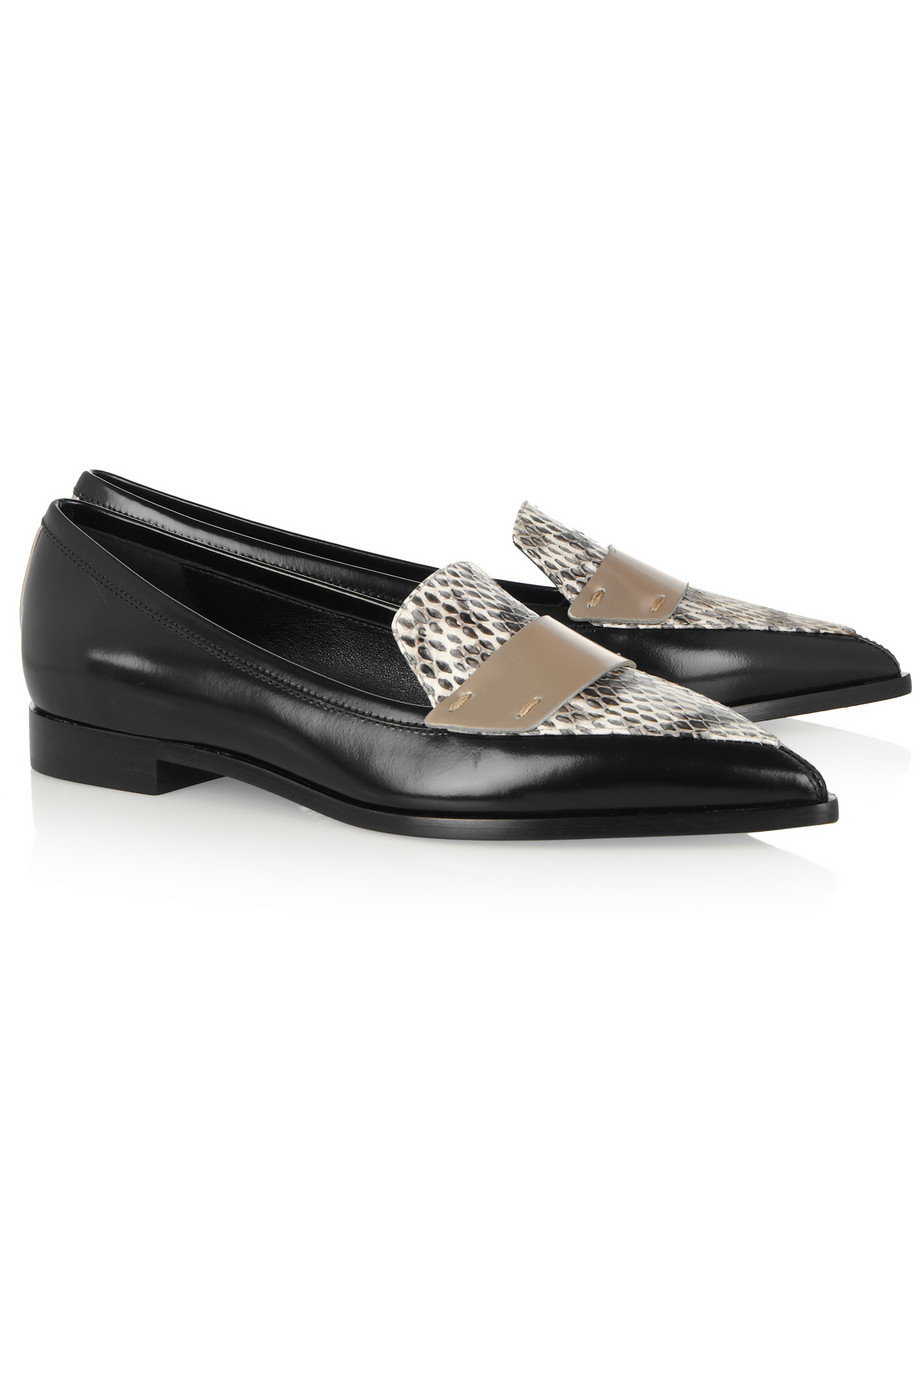 Nicholas Kirkwood - Chaussures(495 €)